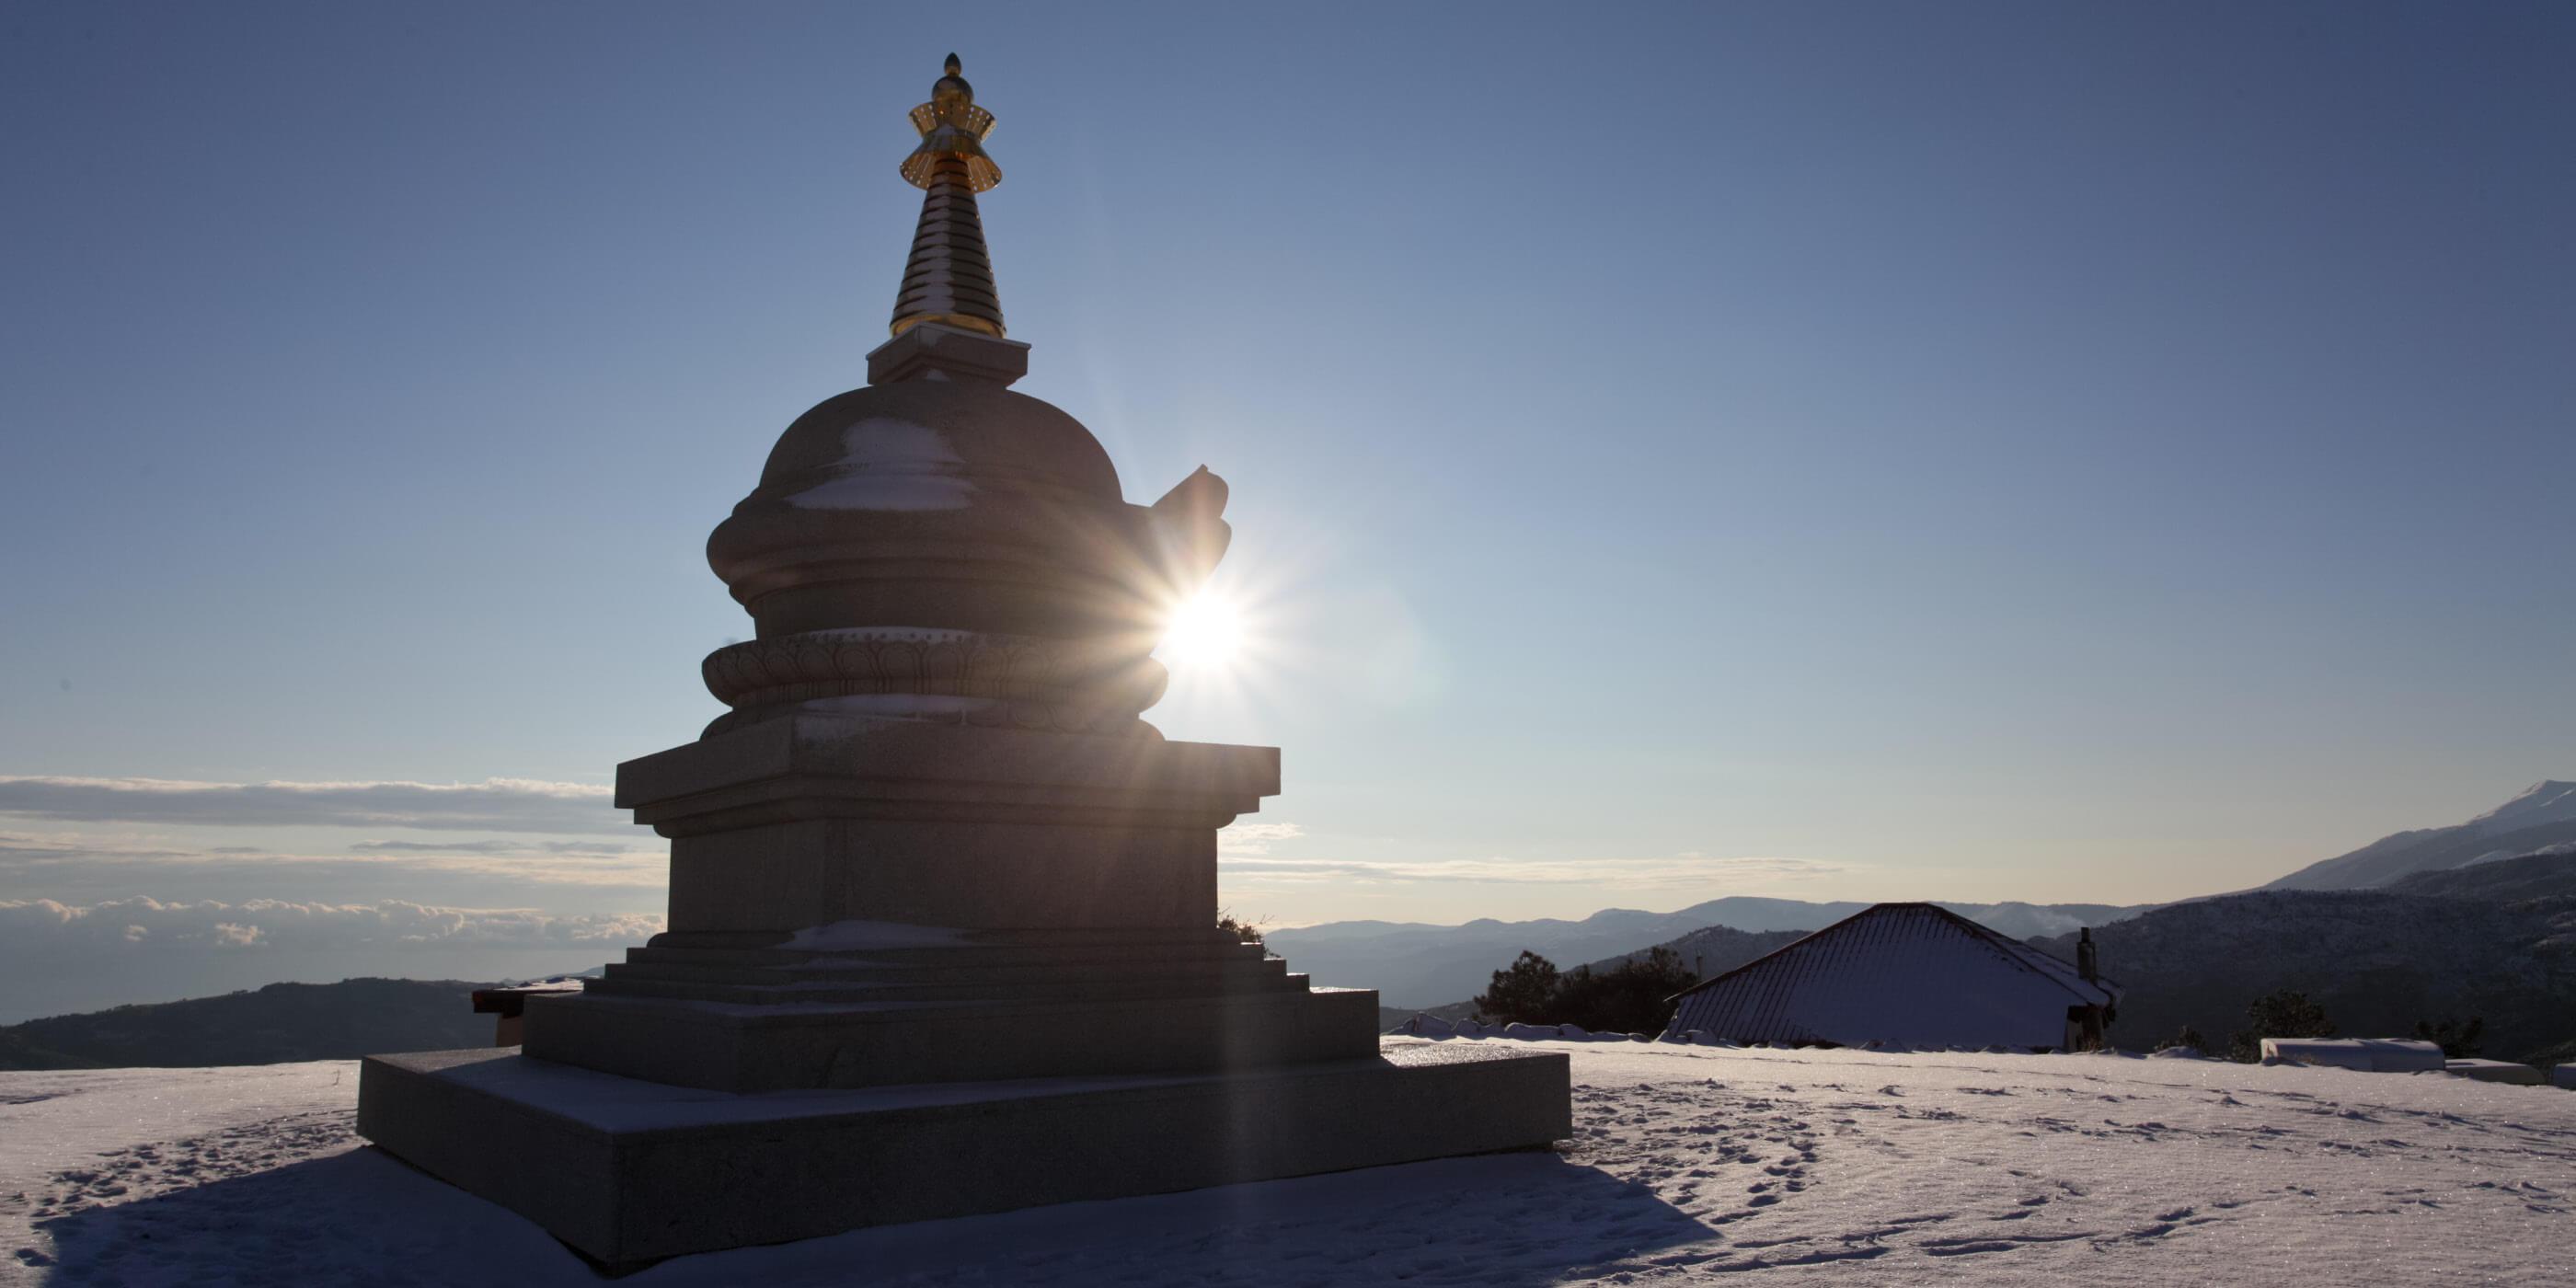 Kalachakra Stupa in KBL